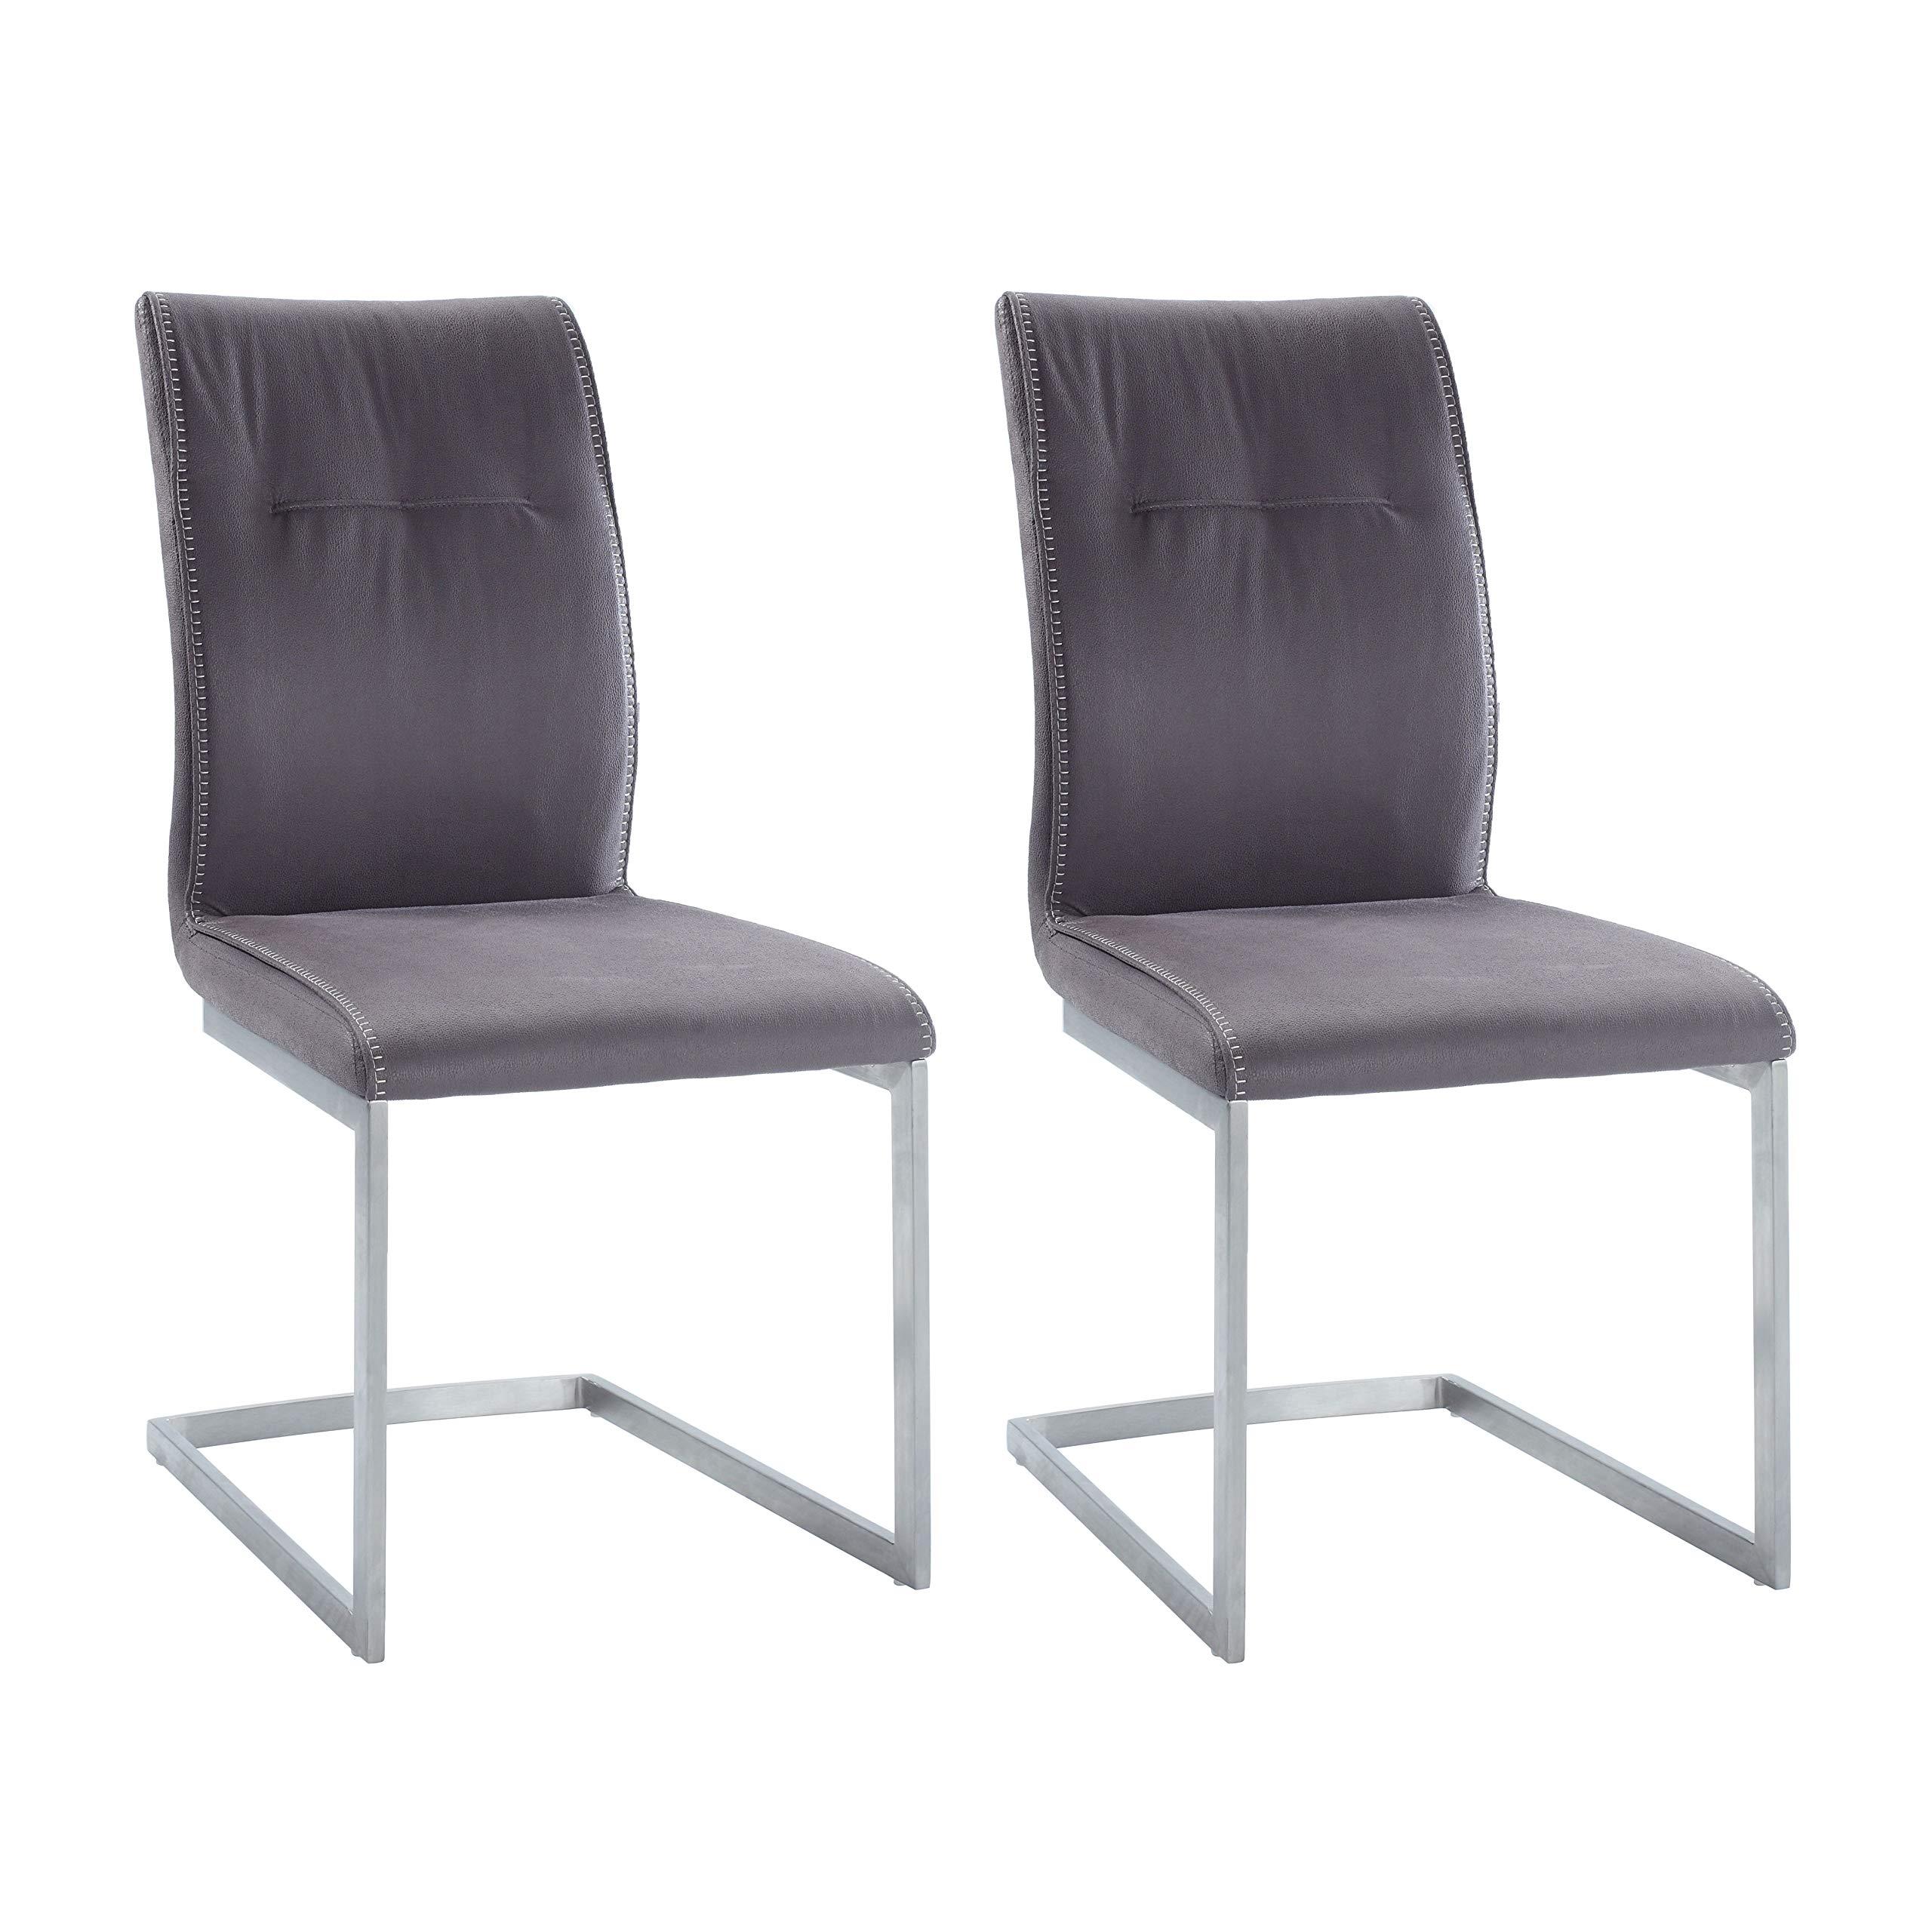 Milan Kaitlynn Grey Cantilever Side Chair (Set of 2)